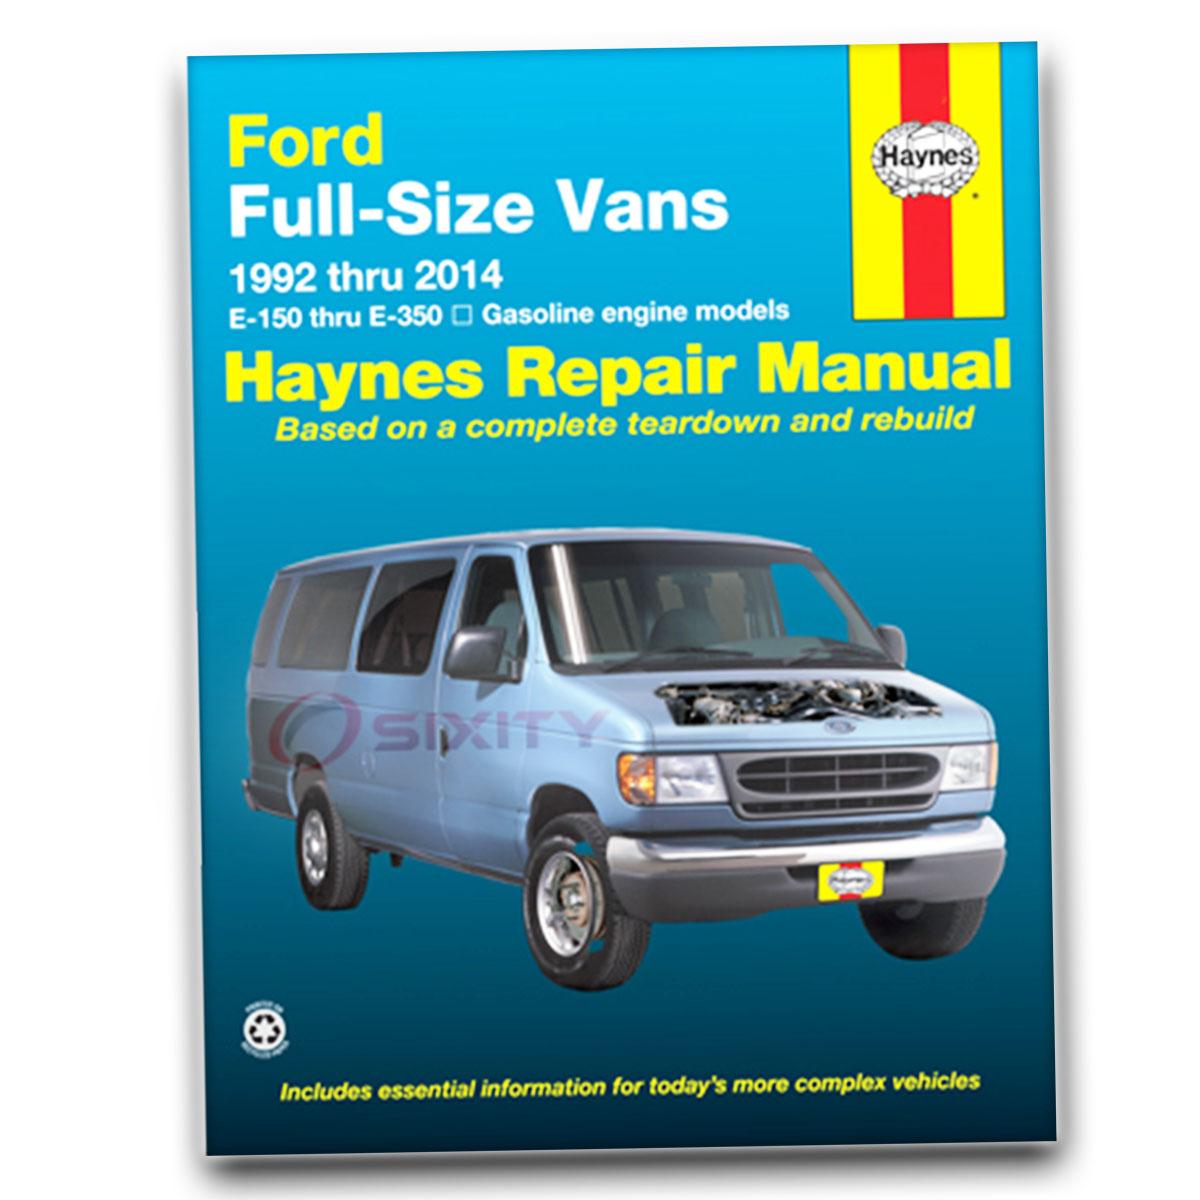 Ford e 350 econoline club wagon haynes repair manual xlt custom hd chateau ge